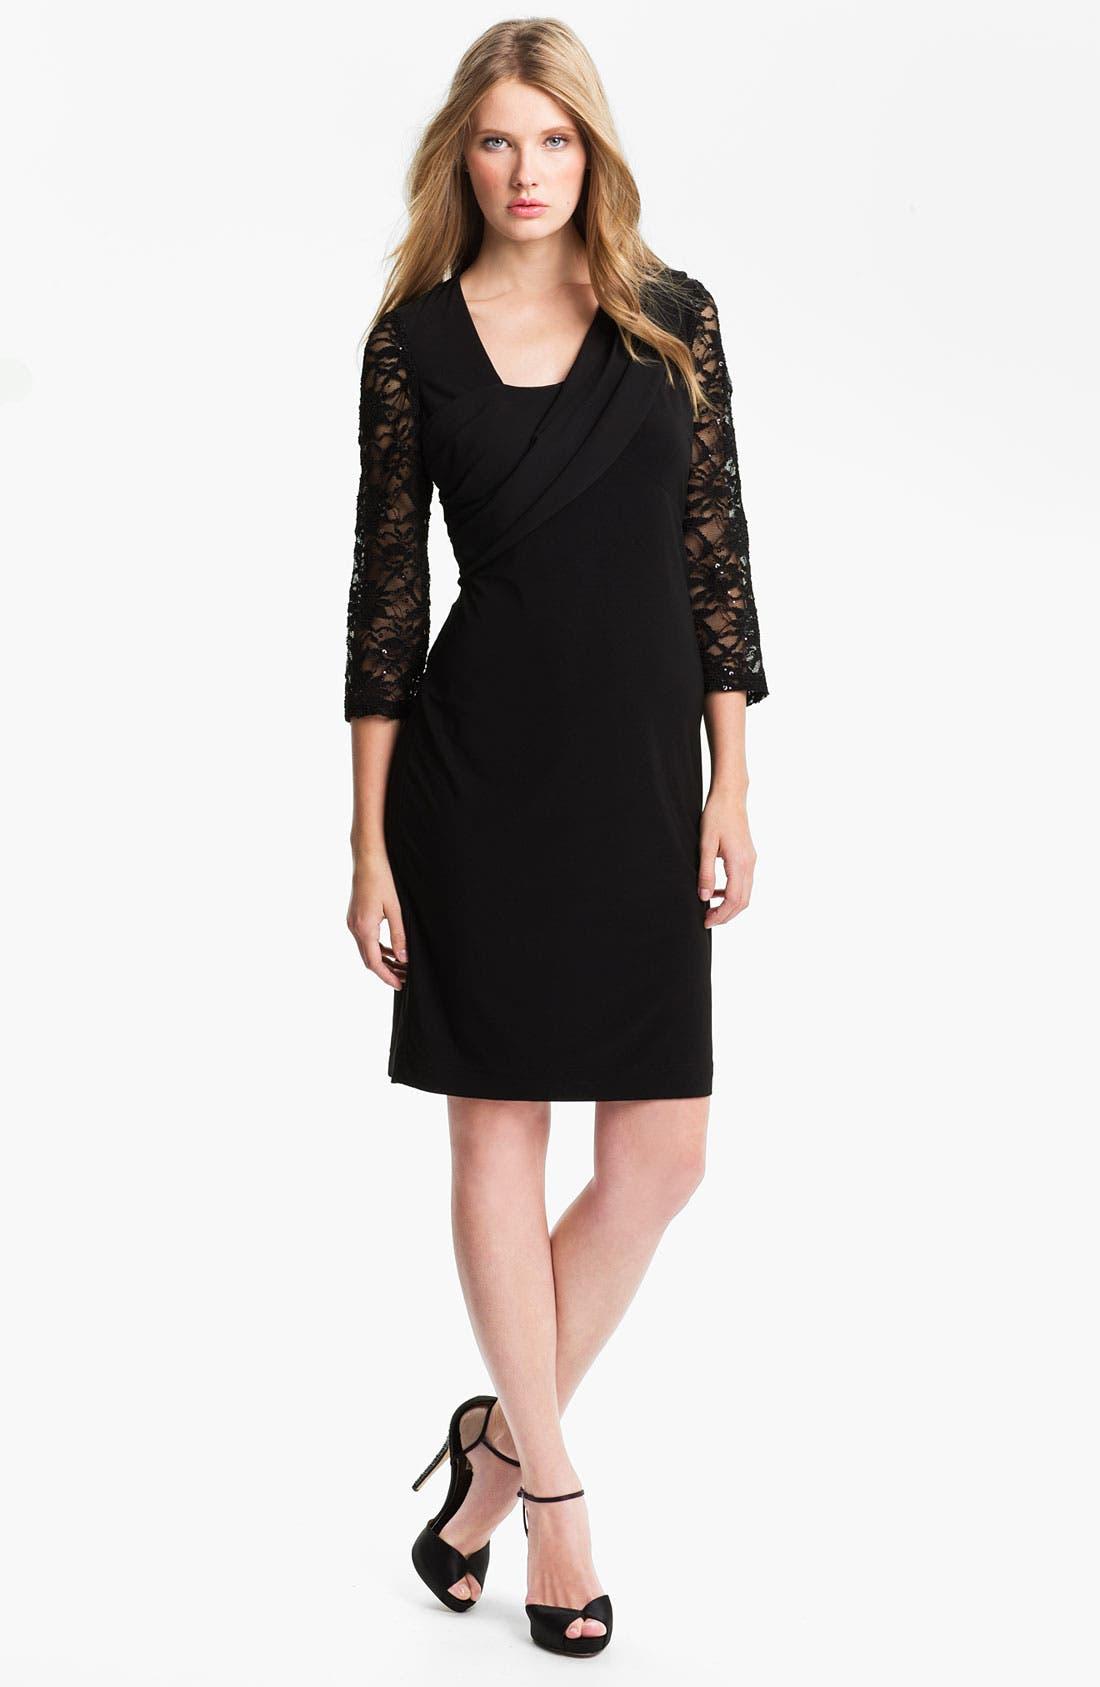 Alternate Image 1 Selected - Alex Evenings Chiffon Detail Jersey Shift Dress